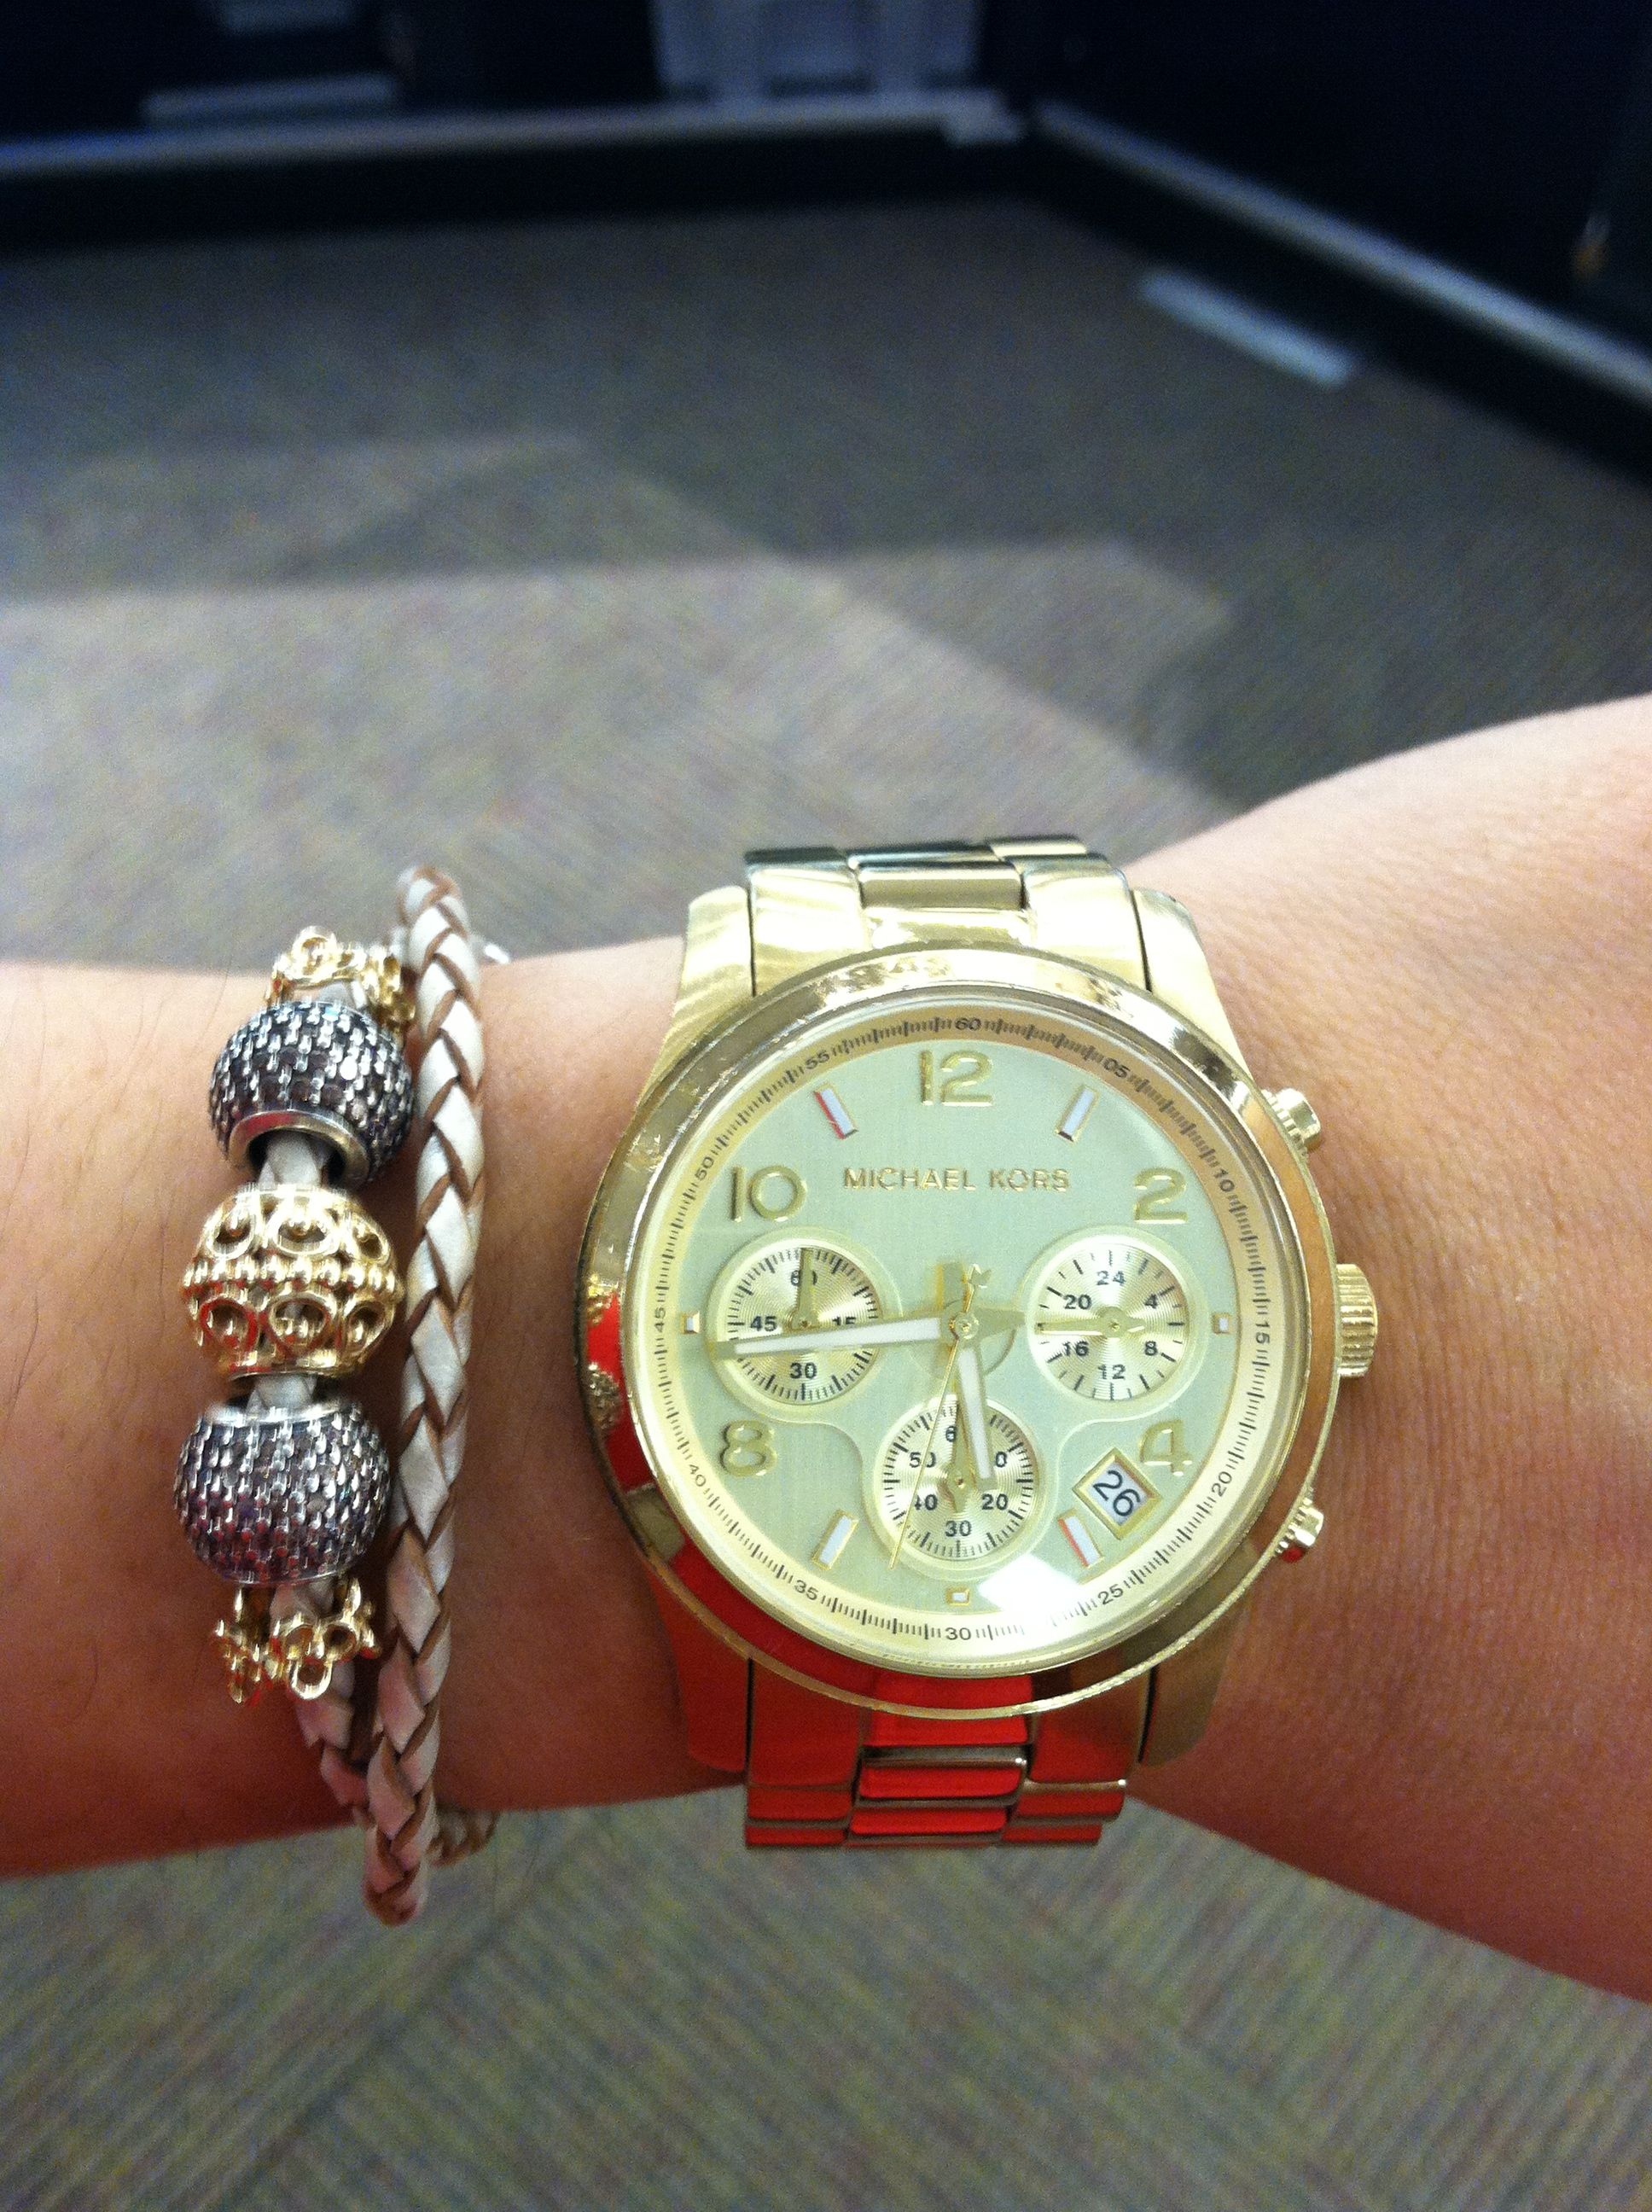 Pandora bracelet dillards - Michael Kors Watch With Pandora Double Leather Bracelet With Gold And Pave Beads